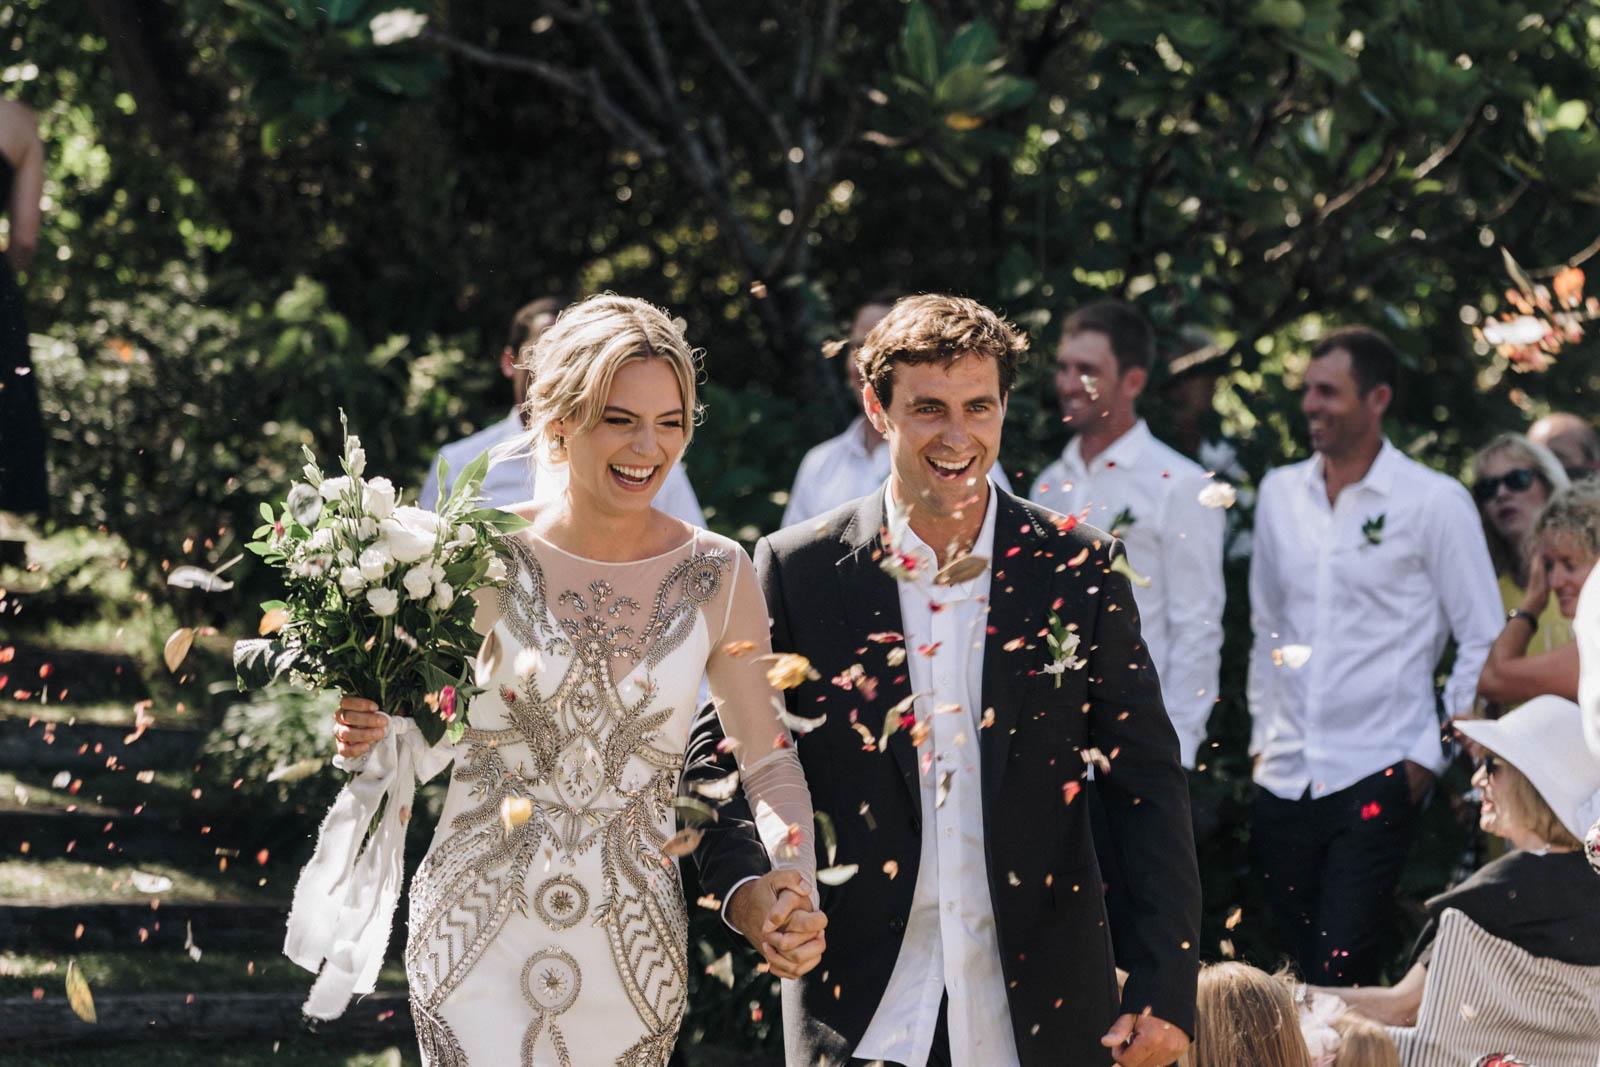 newfound-l-i-coromandel-wedding-photographer-1617-A9_03135